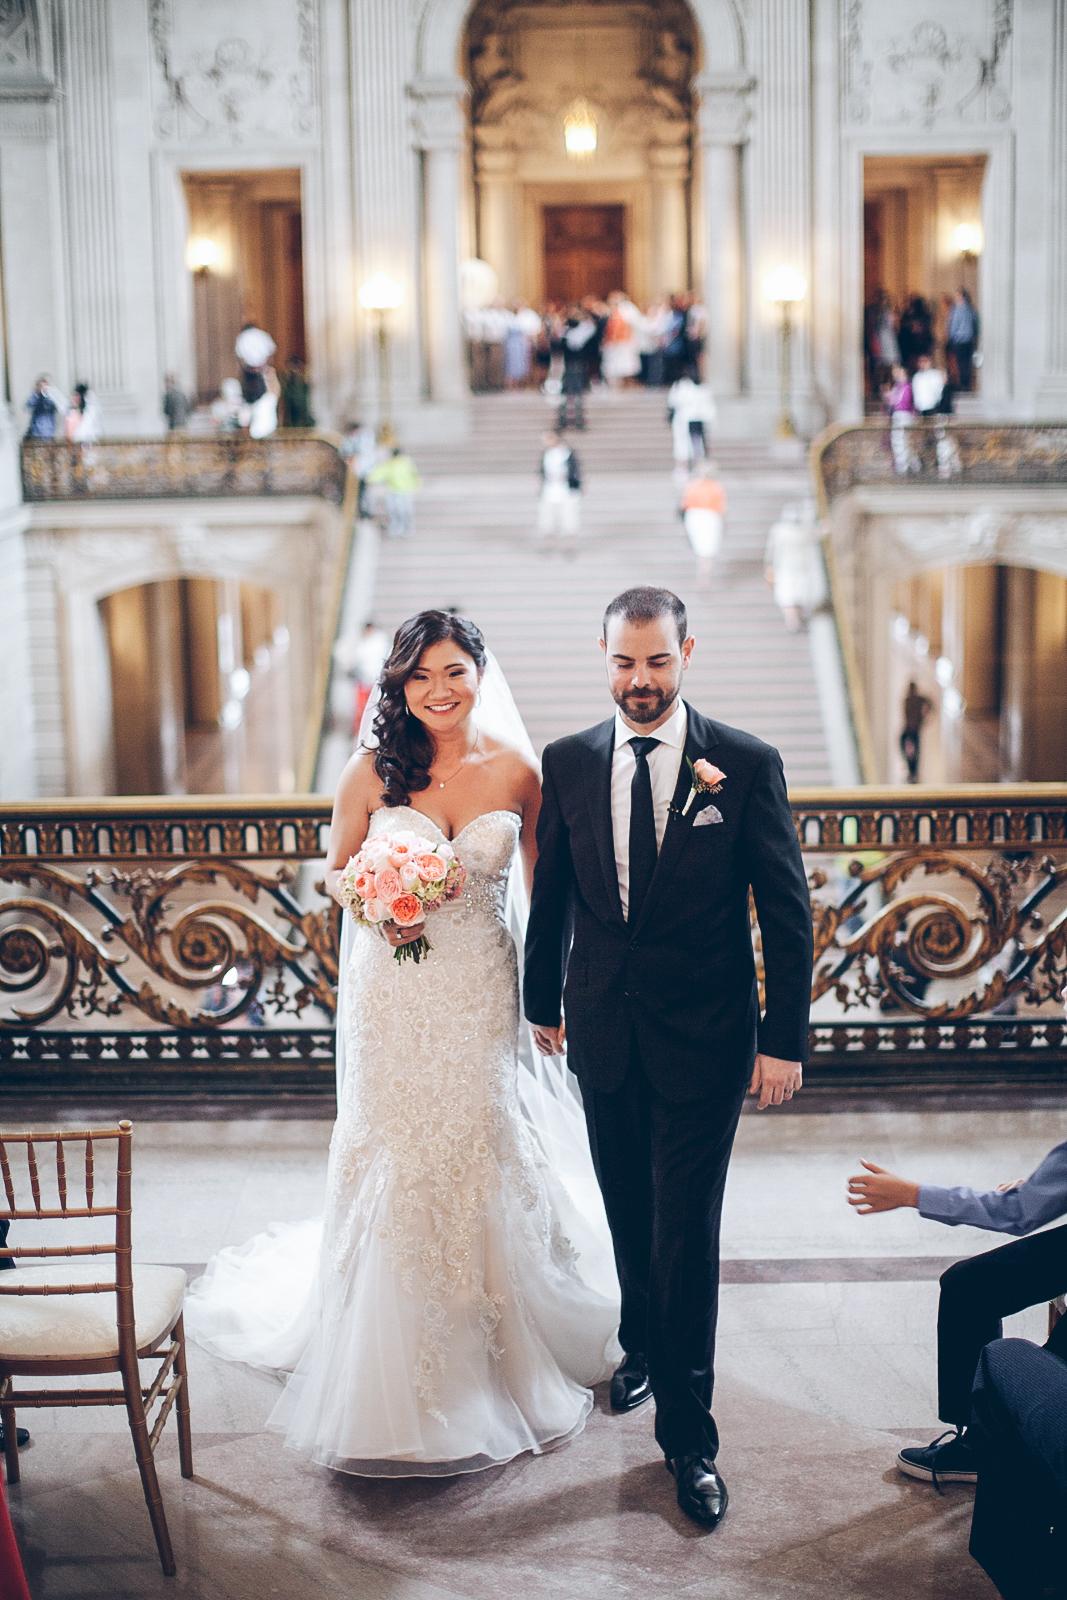 San_francisco_city_hall_wedding_photography_meegan_travis_ebony_siovhan_bokeh_photography_28.jpg